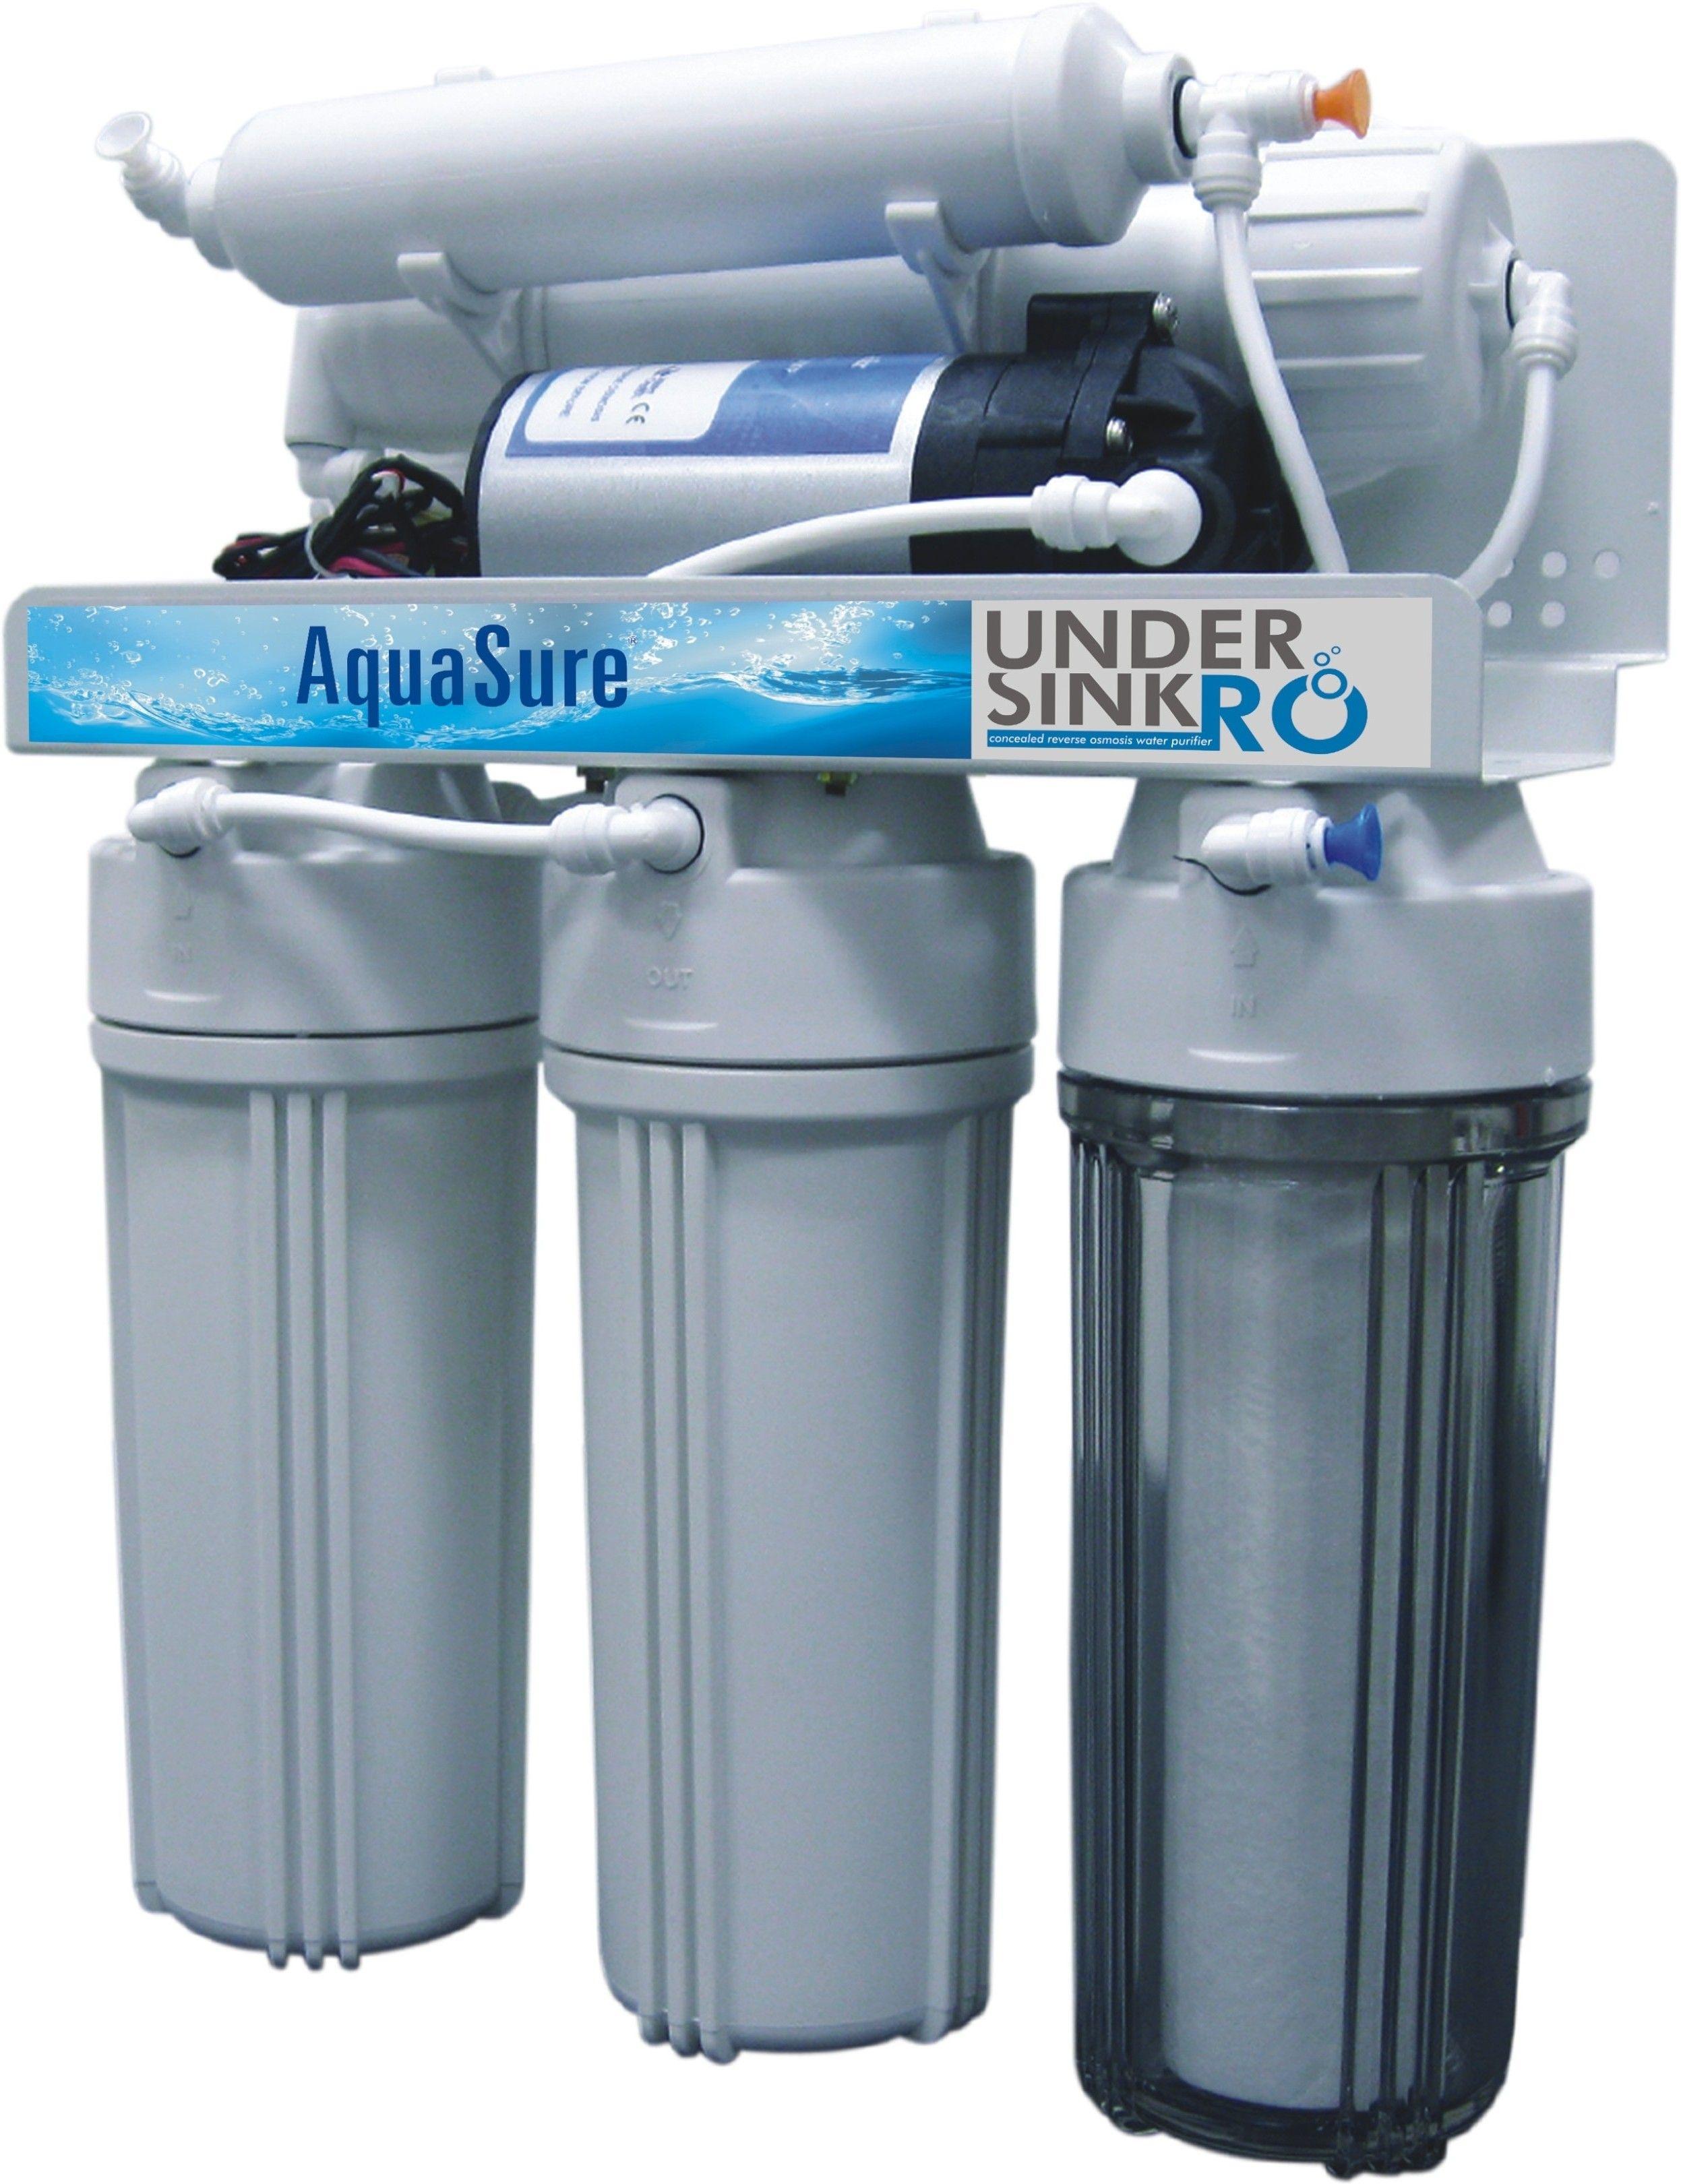 Call aquasure RO Water Purifier TollFree Number, Helpline